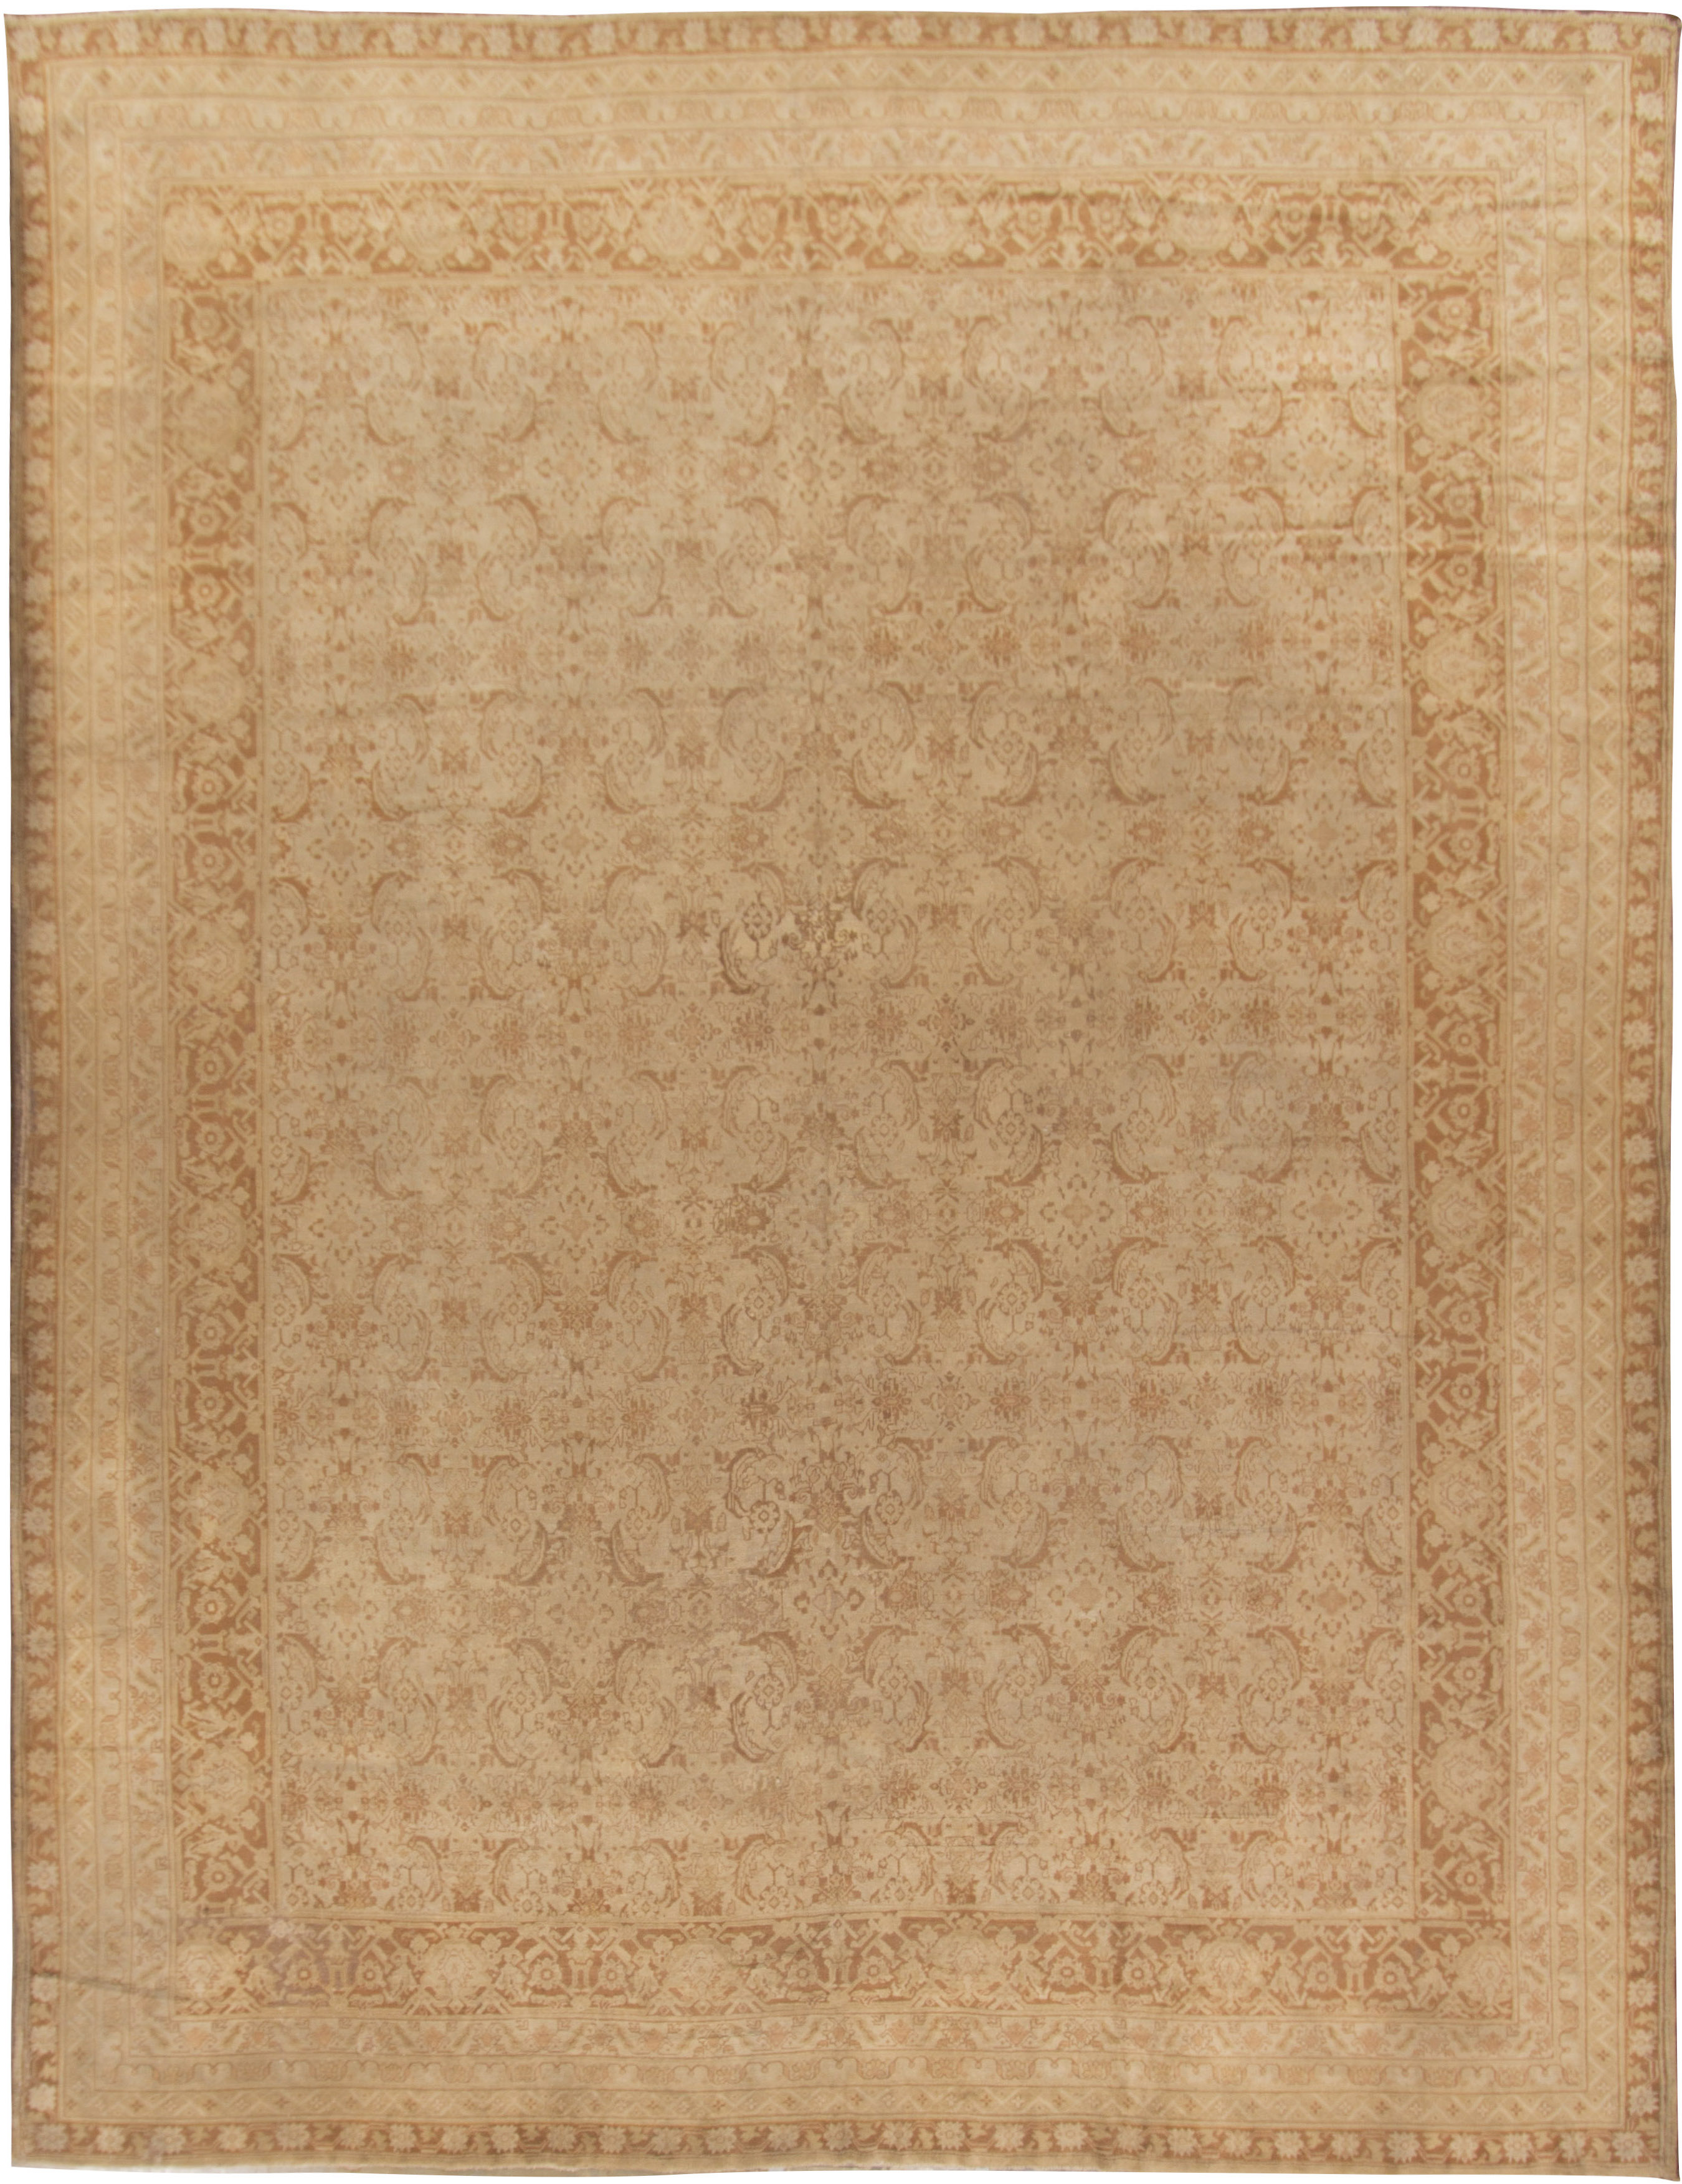 Large Antique Indian Agra Rug